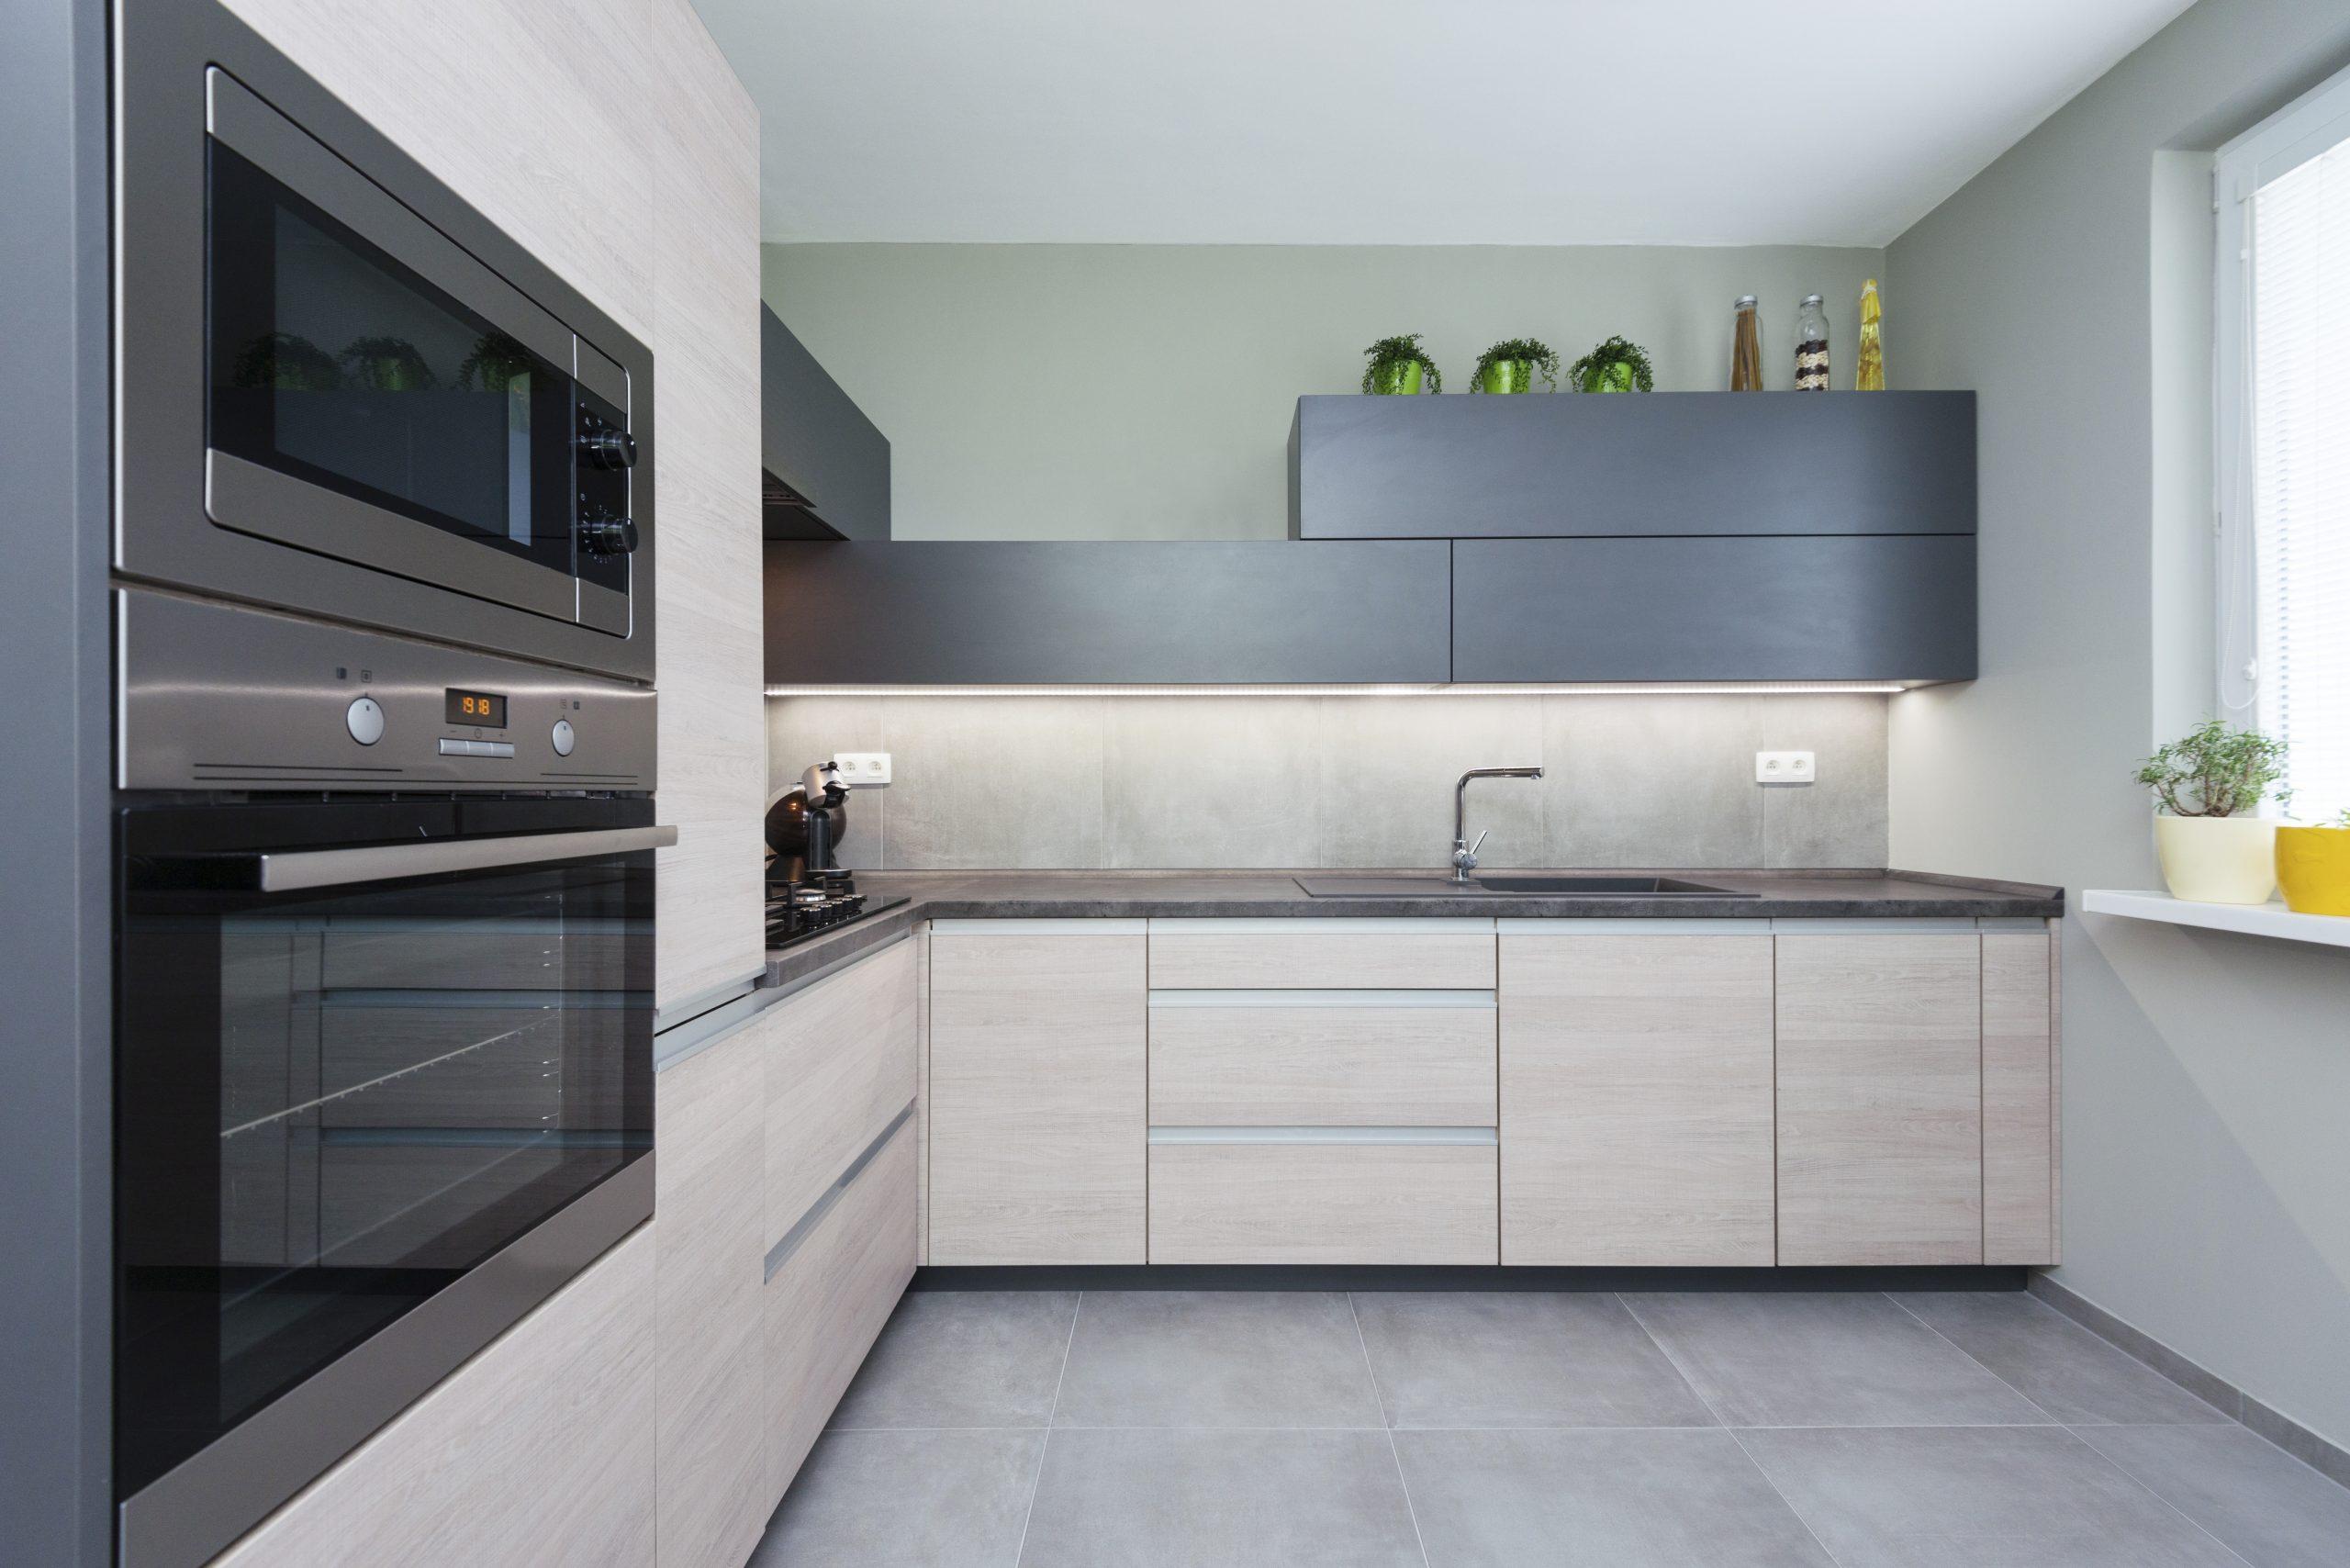 Elegant and comfortable kitchen interior